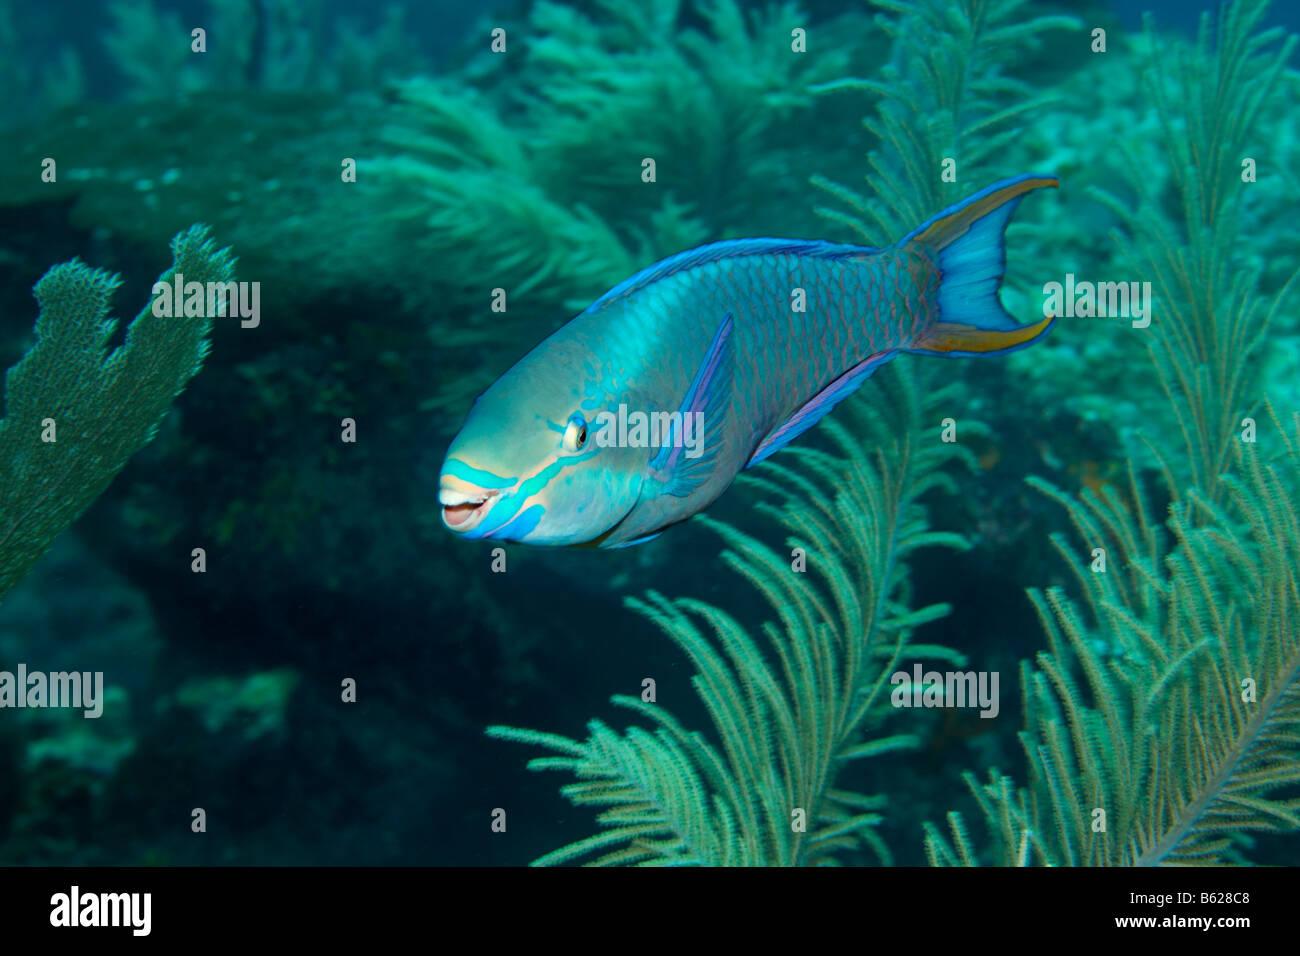 Queen-Papageienfisch (Scarus Vetula), Weichkorallen, Barrier Reef, San Pedro, Ambergris Cay Insel, Belize, Mittelamerika, Stockbild